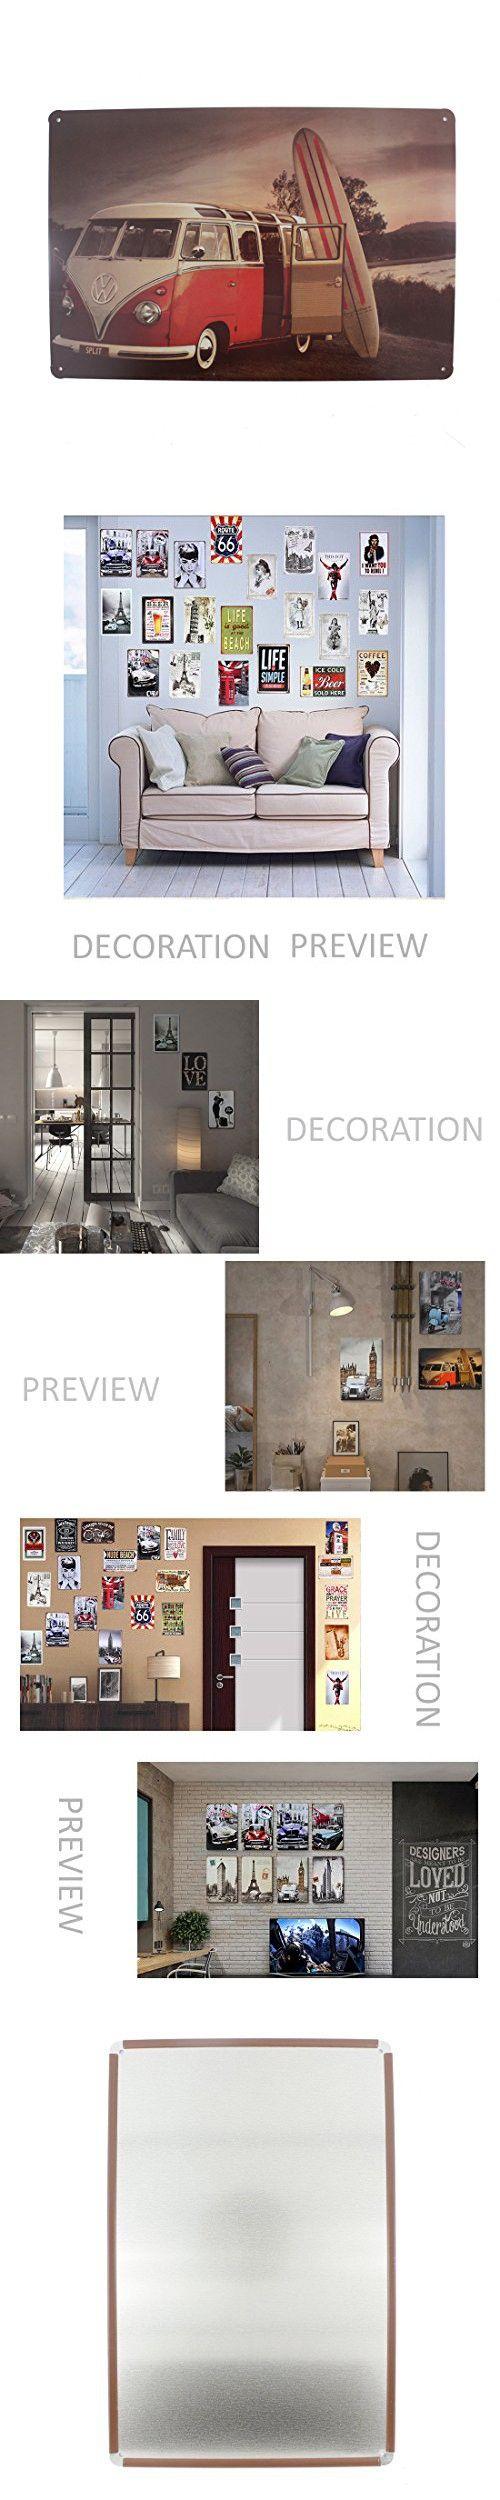 1802 best minimalist home decor images on pinterest minimalist 12x8 inches pub bar home wall decor souvenir hanging metal tin sign plate plaque